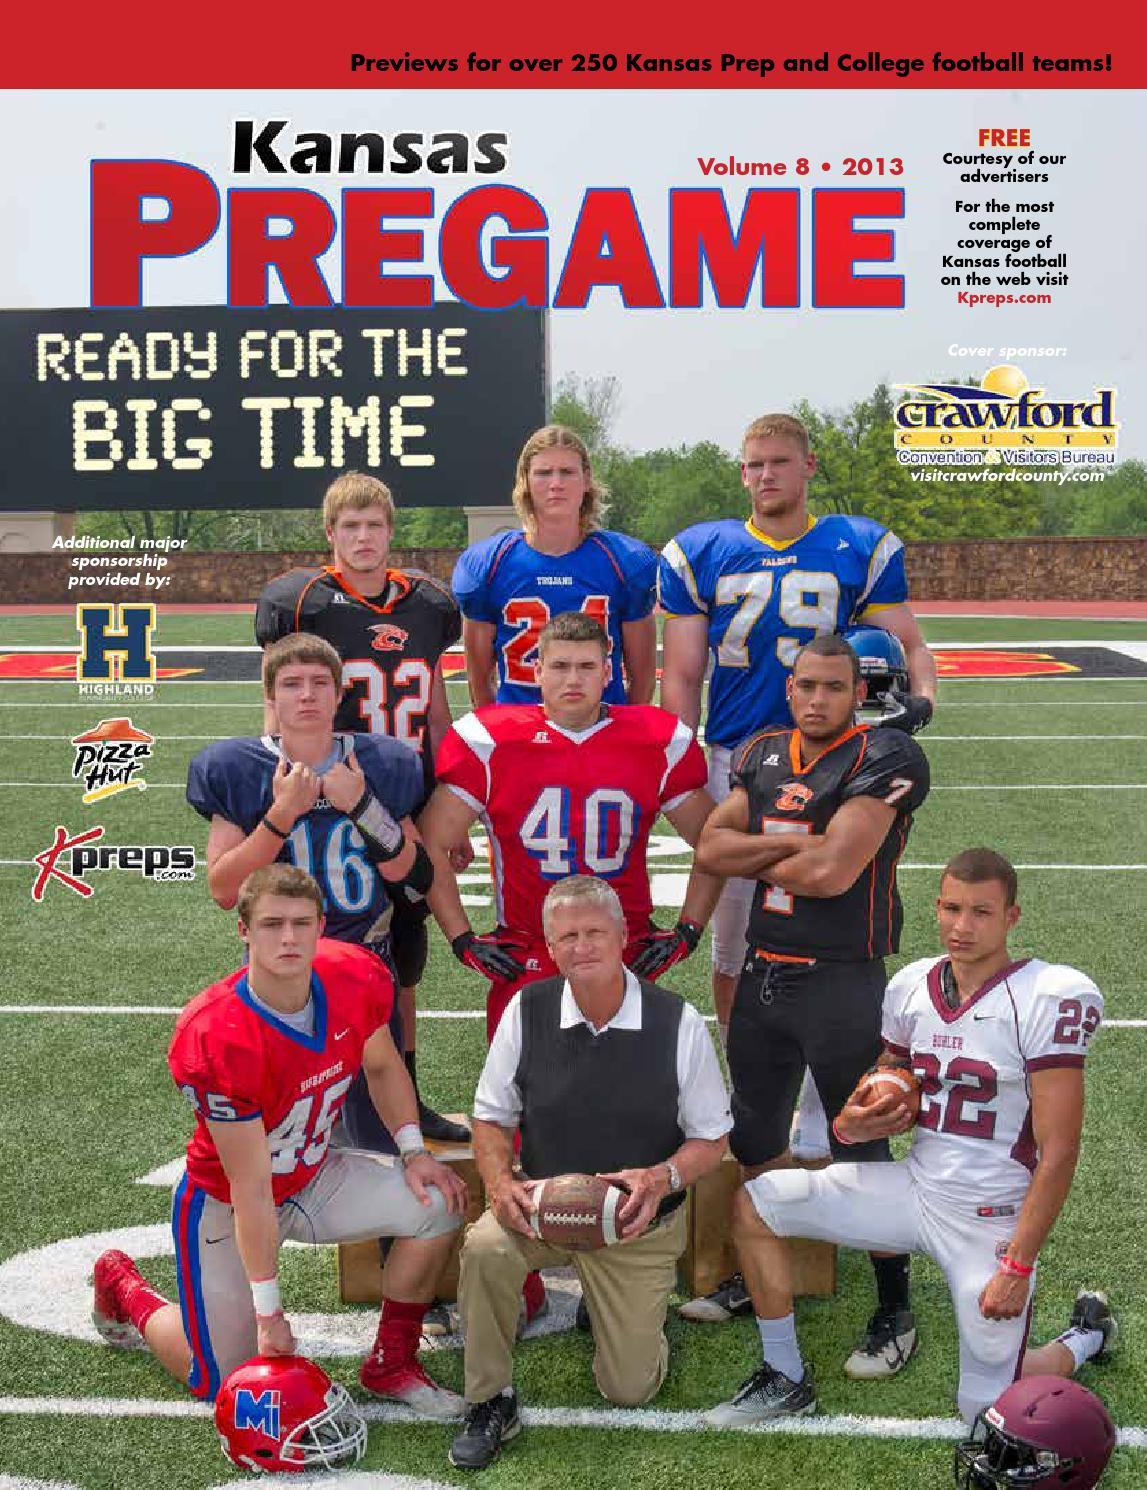 Kansas Pregame 2013 By Sixteen 60 Publishing Co Issuu